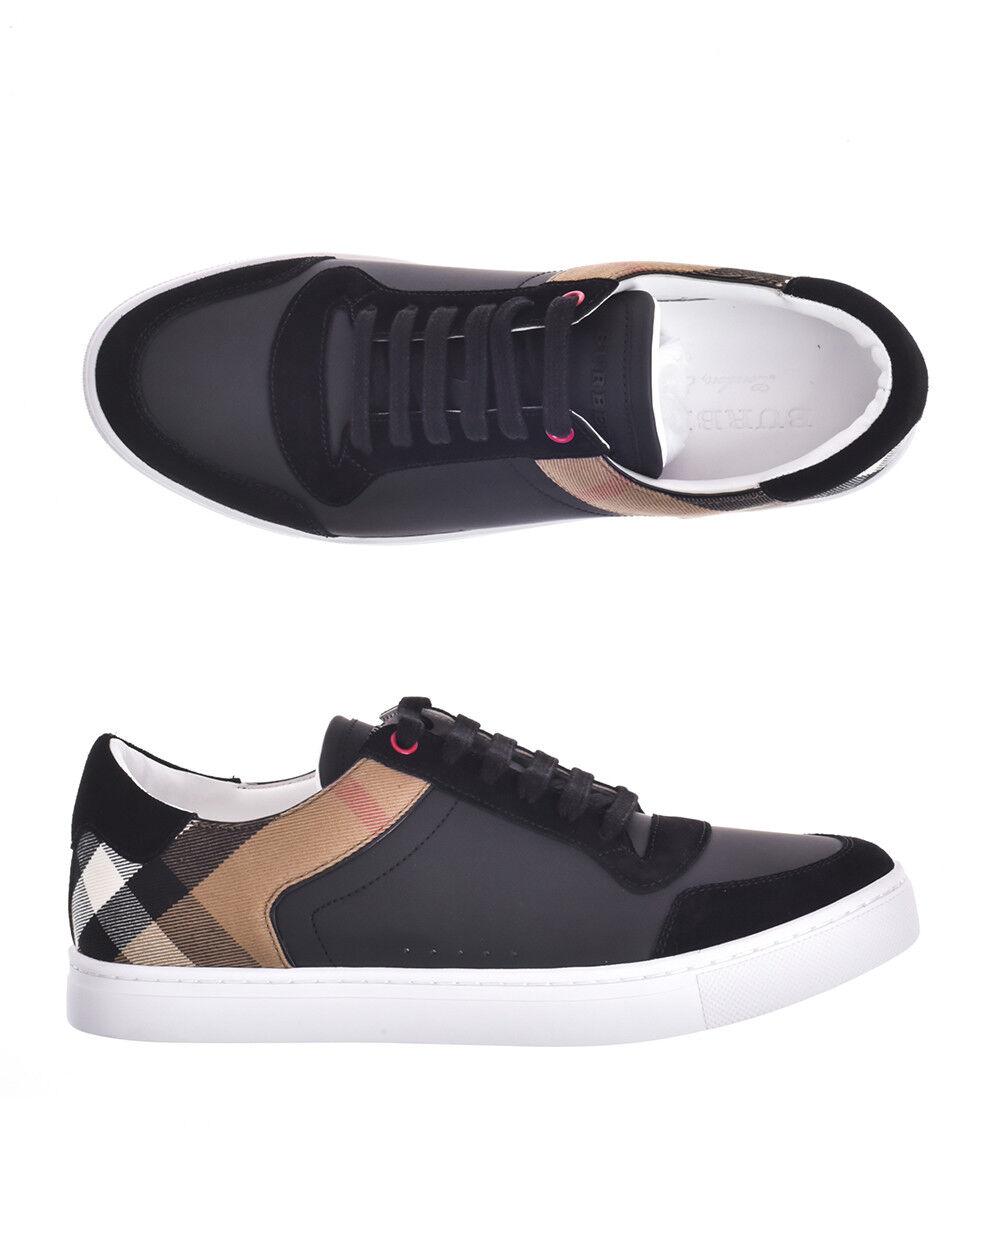 Burberry scarpe scarpe da ginnastica REETH LOW Leather Man nero 4054021